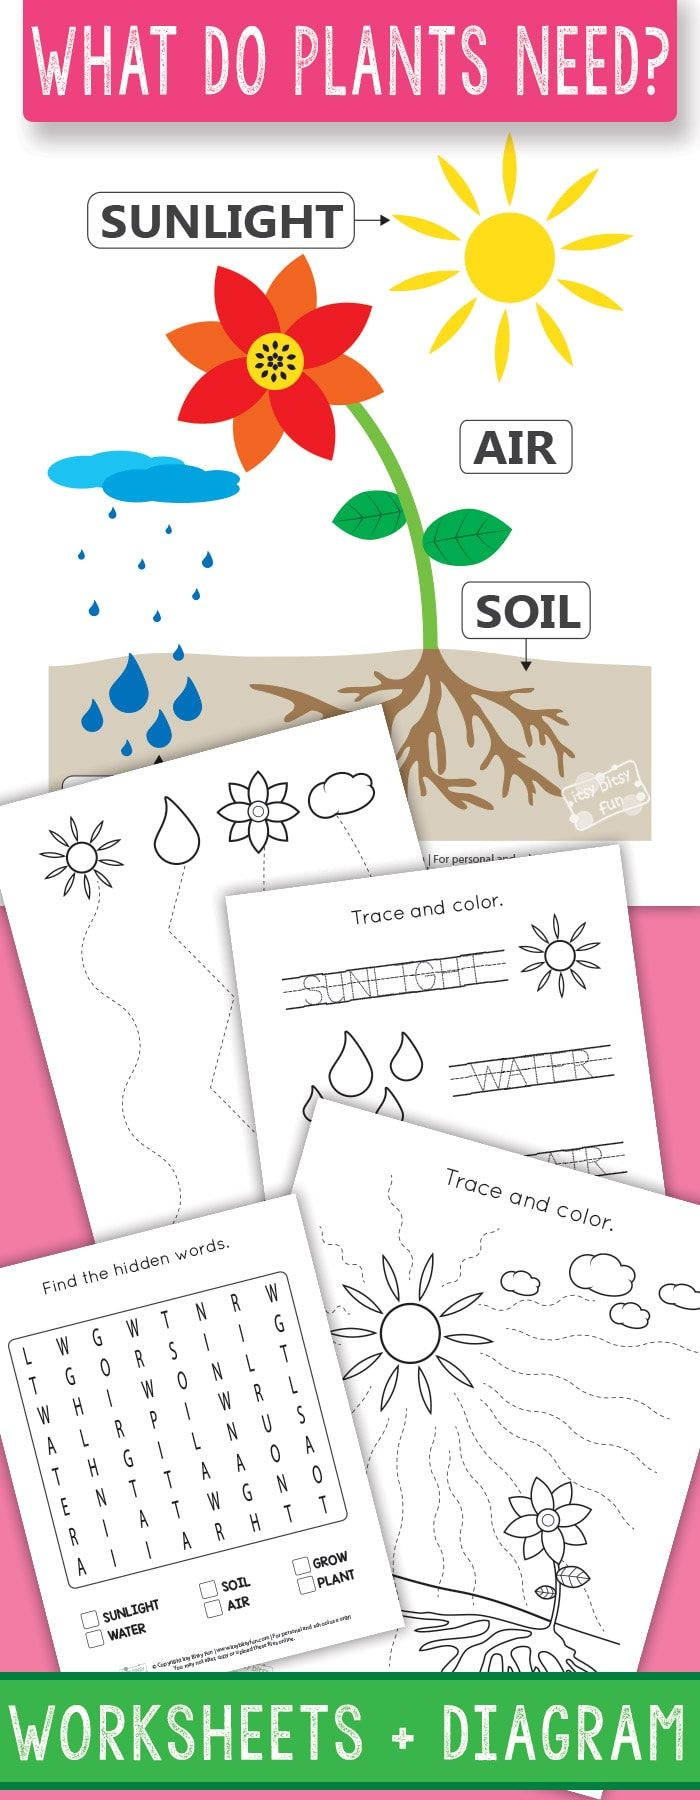 What do Plants Need to Grow Worksheets - itsybitsyfun.com   Plants  kindergarten [ 1800 x 700 Pixel ]